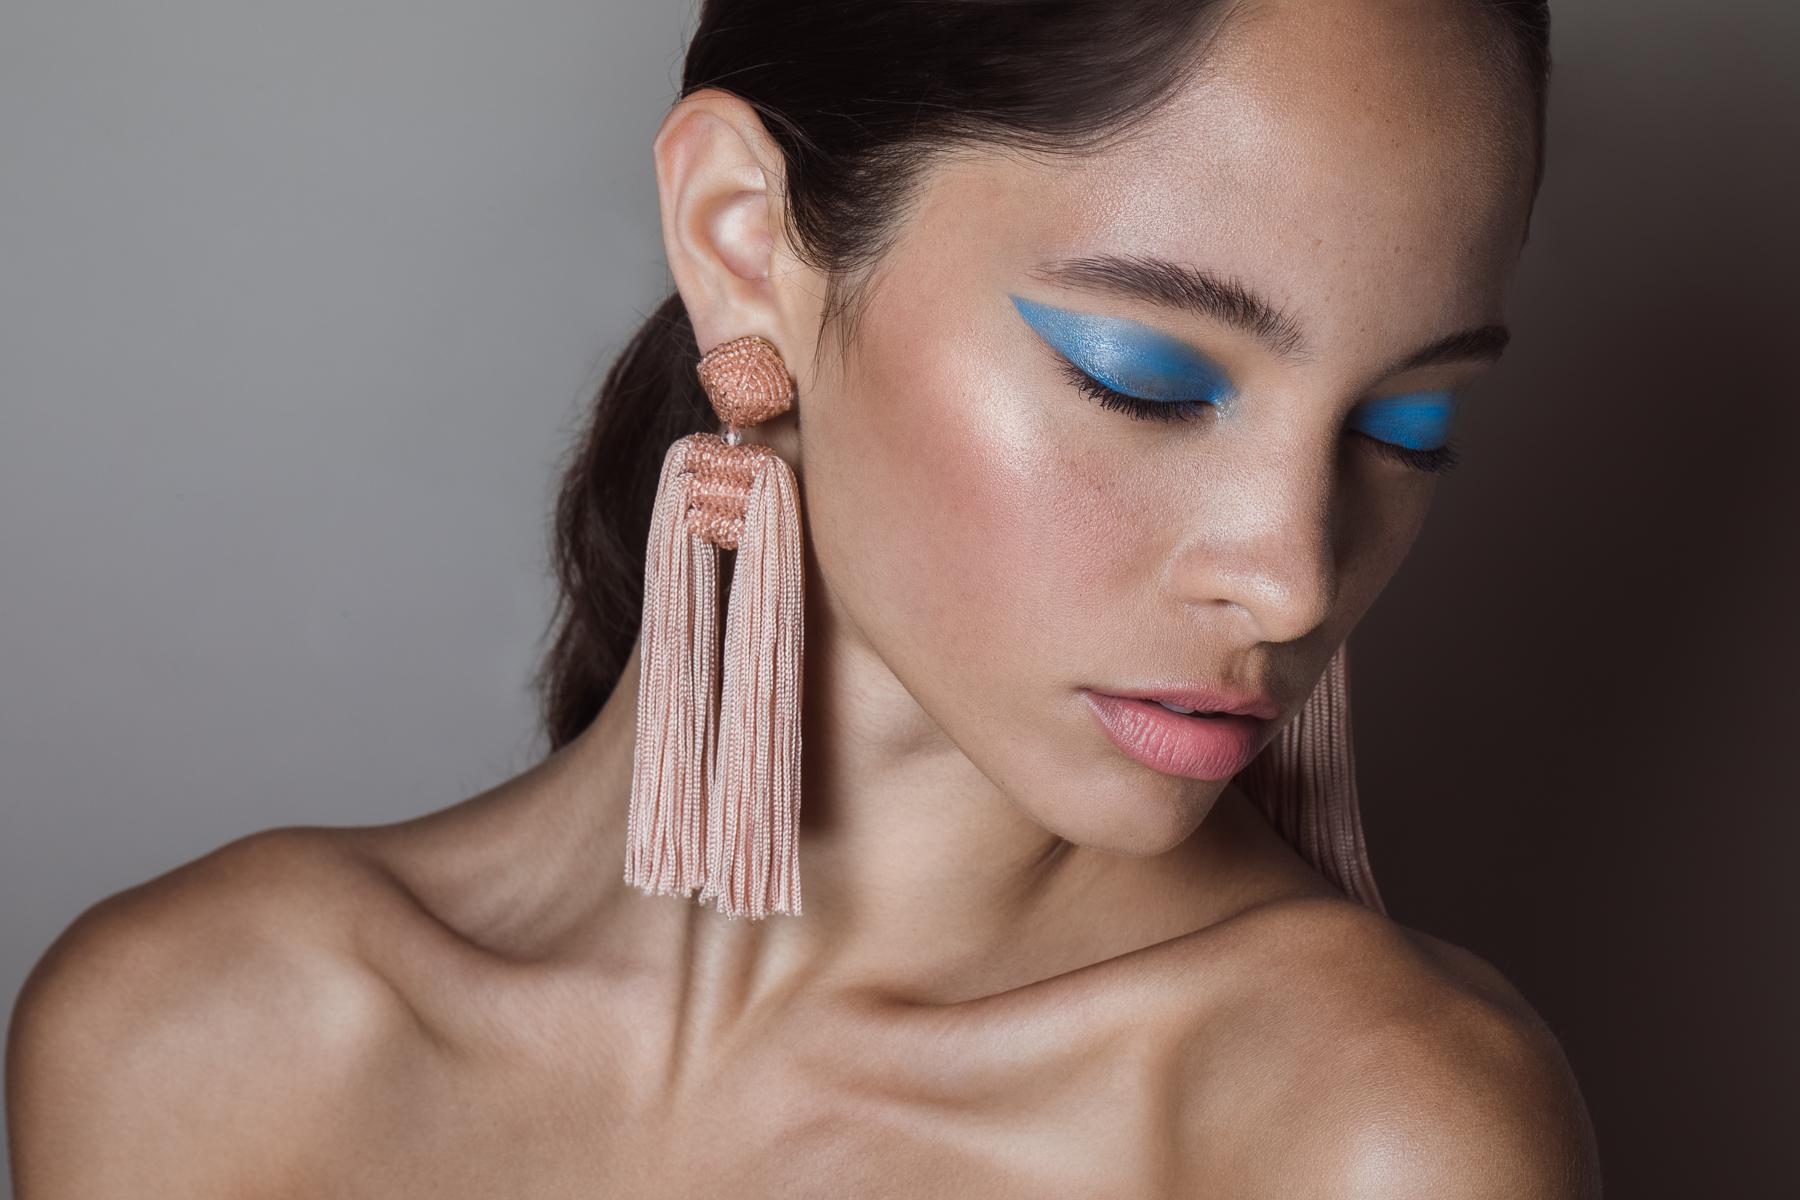 Cenie Frieson - Beauty Test - Final Images-5.jpg